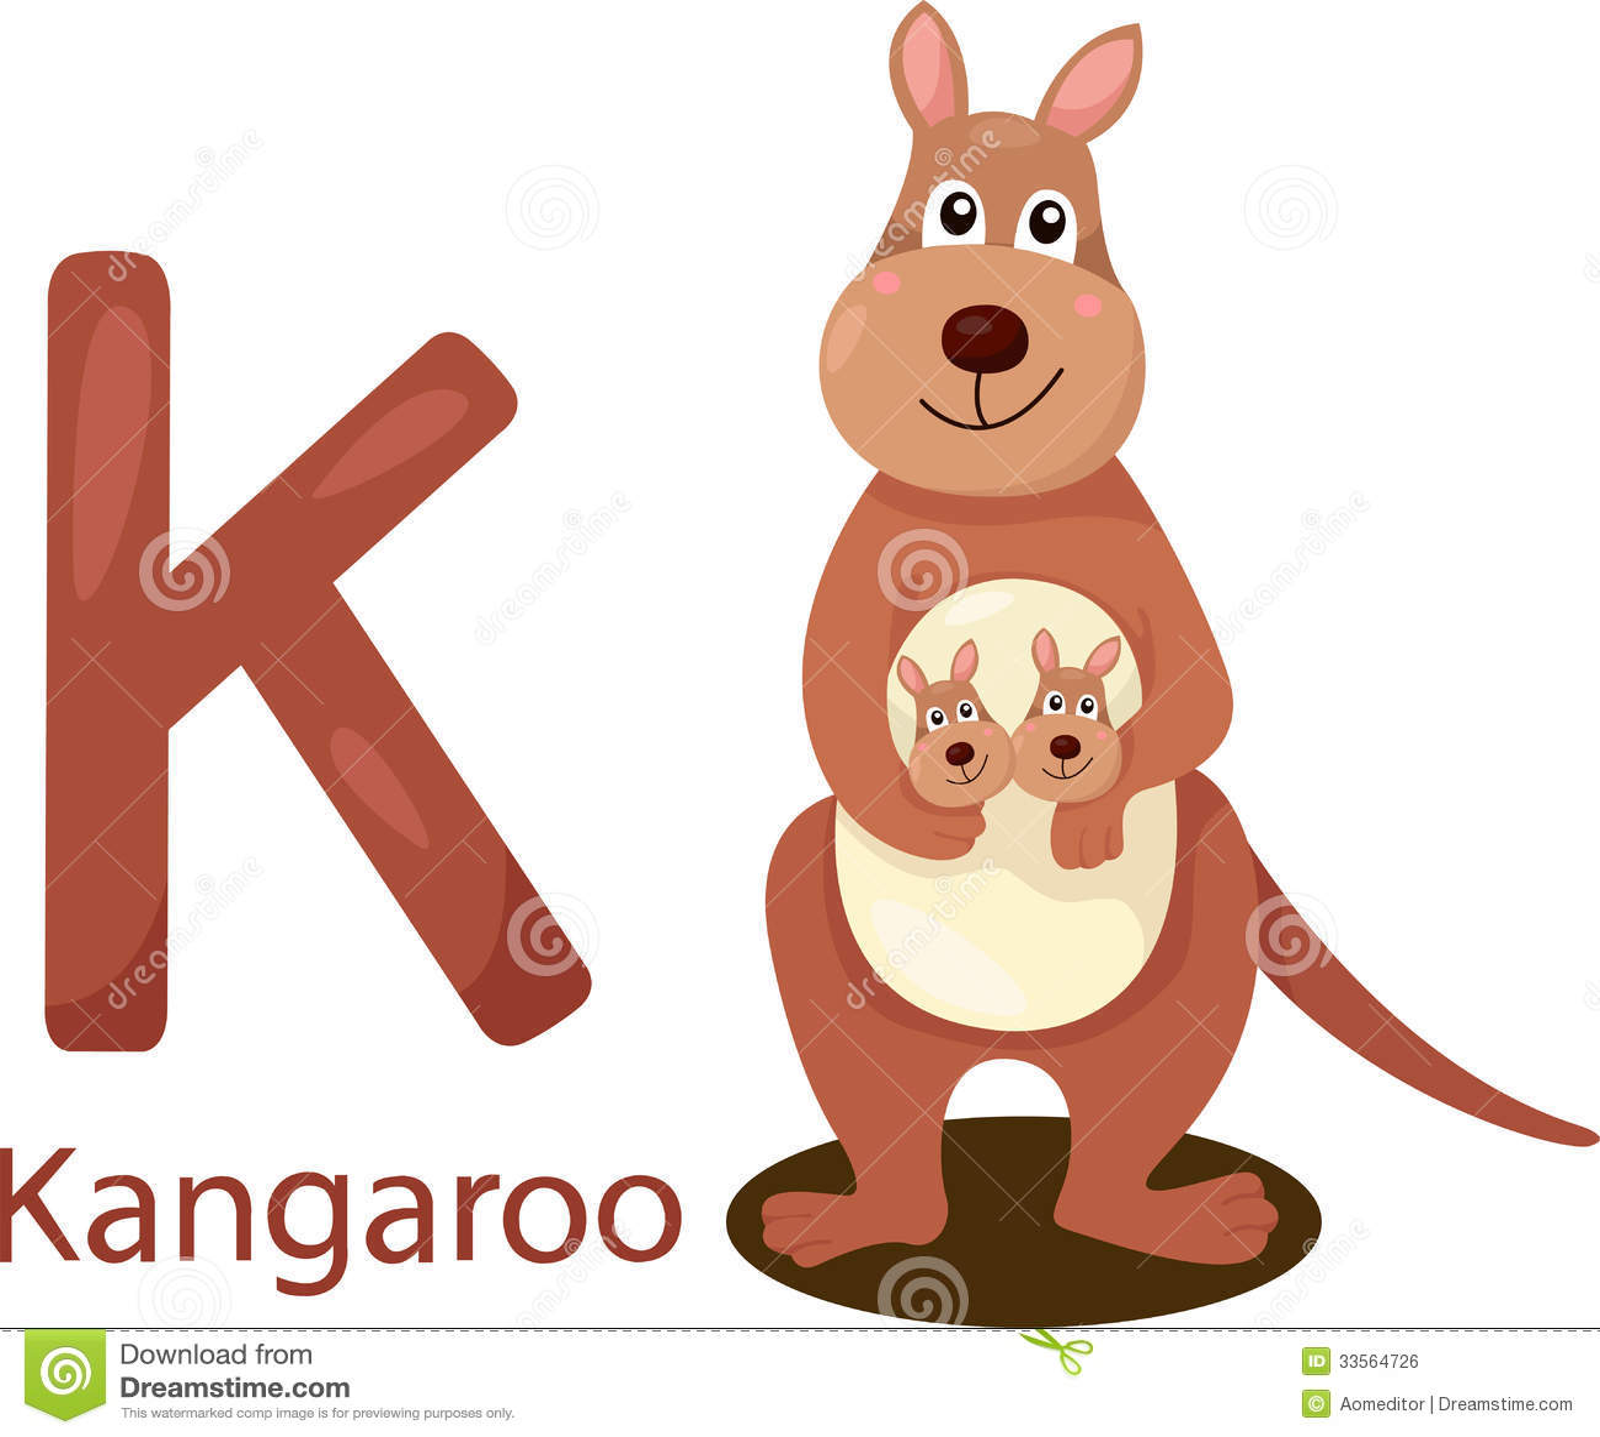 Illustrator Of K With Kangaroo Royalty Free Stock Image